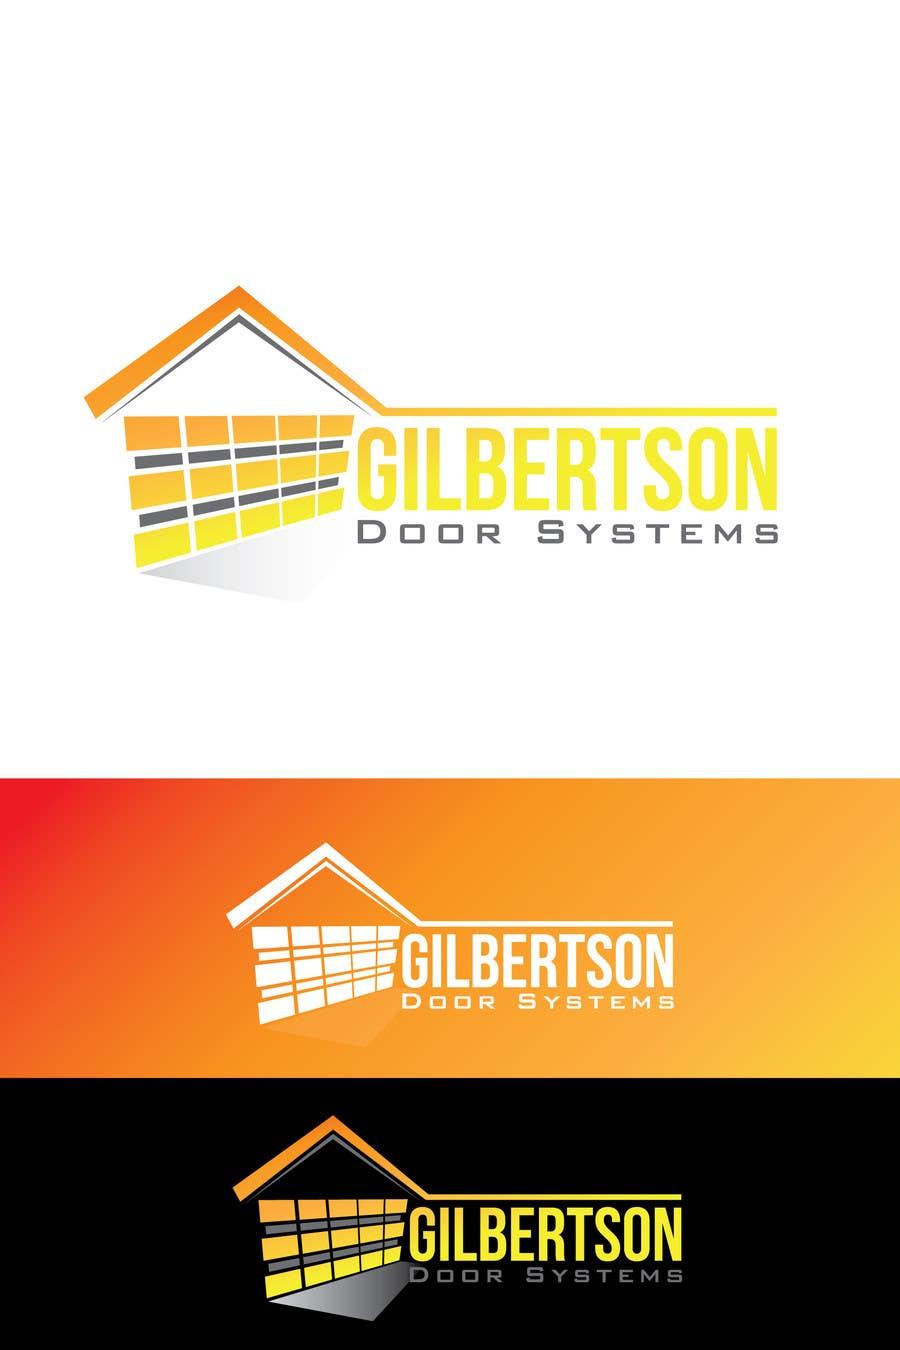 Kilpailutyö #41 kilpailussa Design a Logo for Gilbertson Door Systems